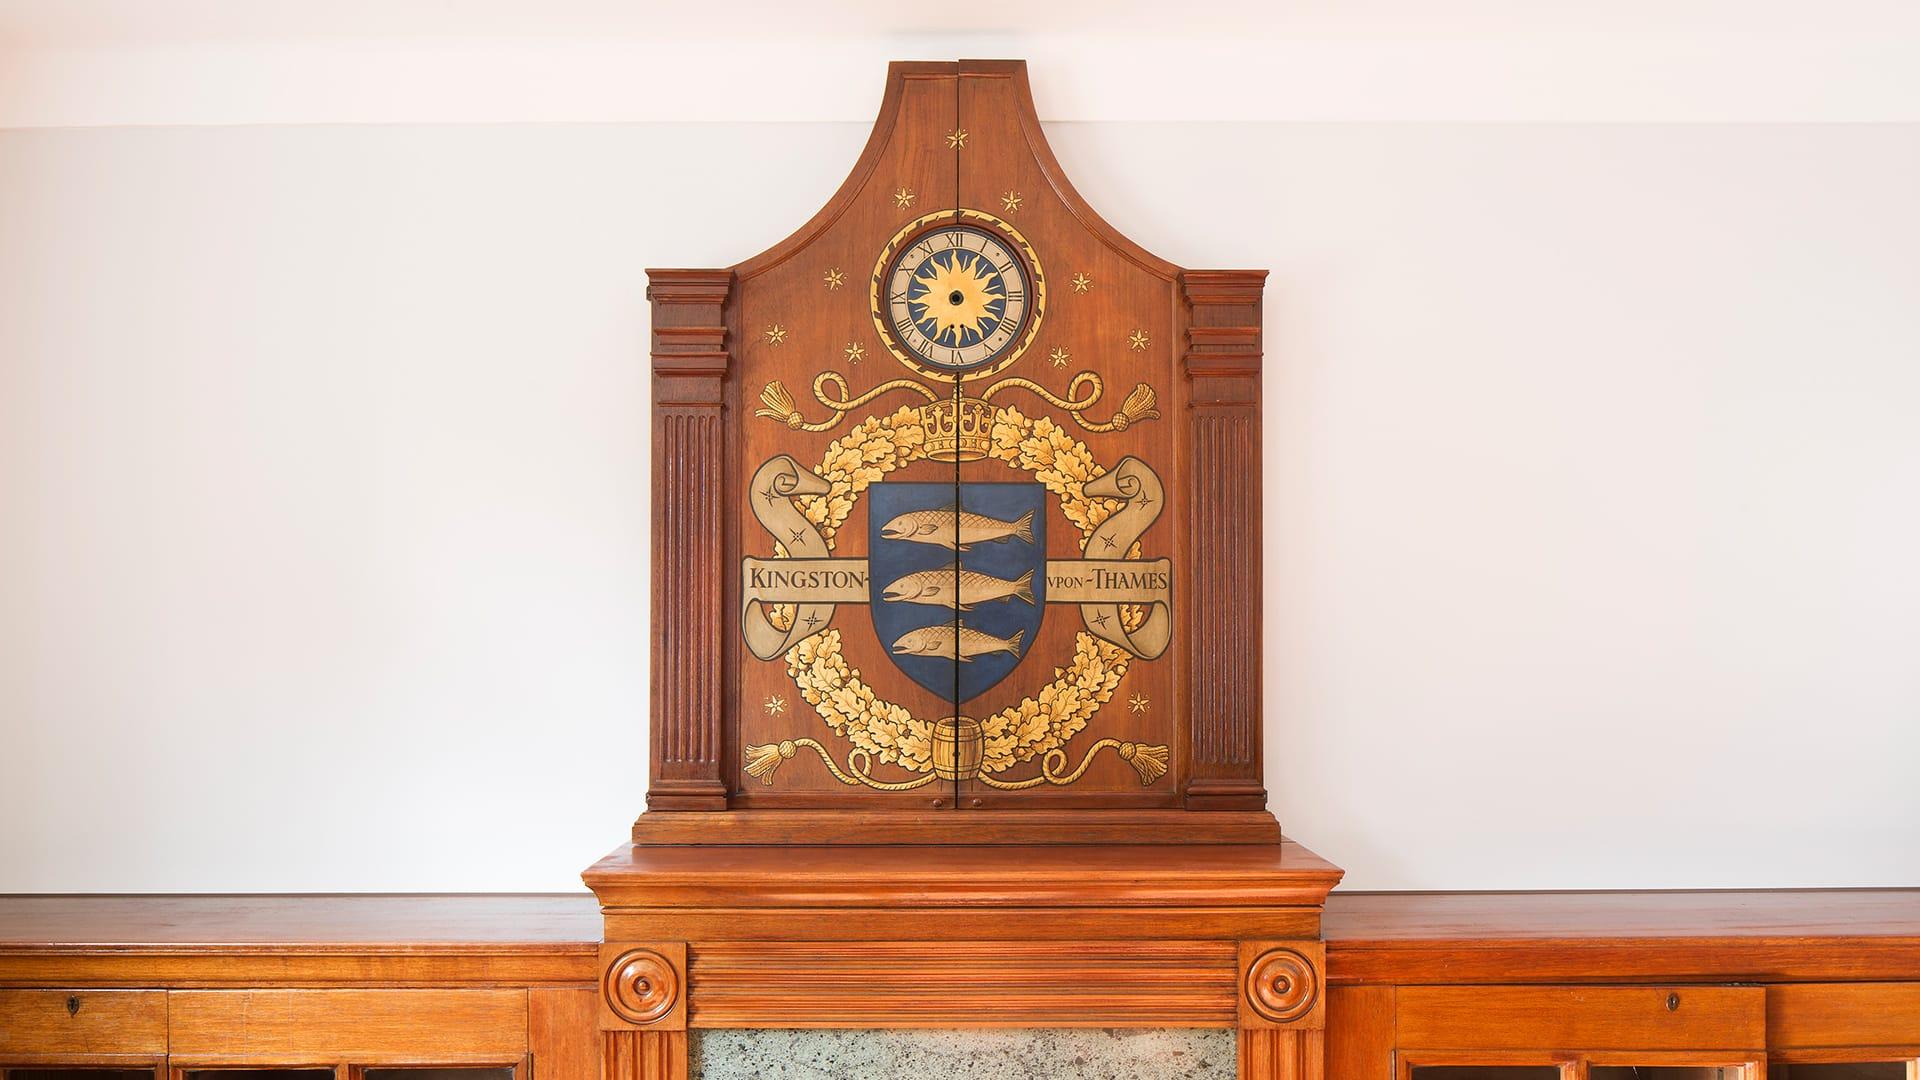 BAL_Kingston old court_1920x1080